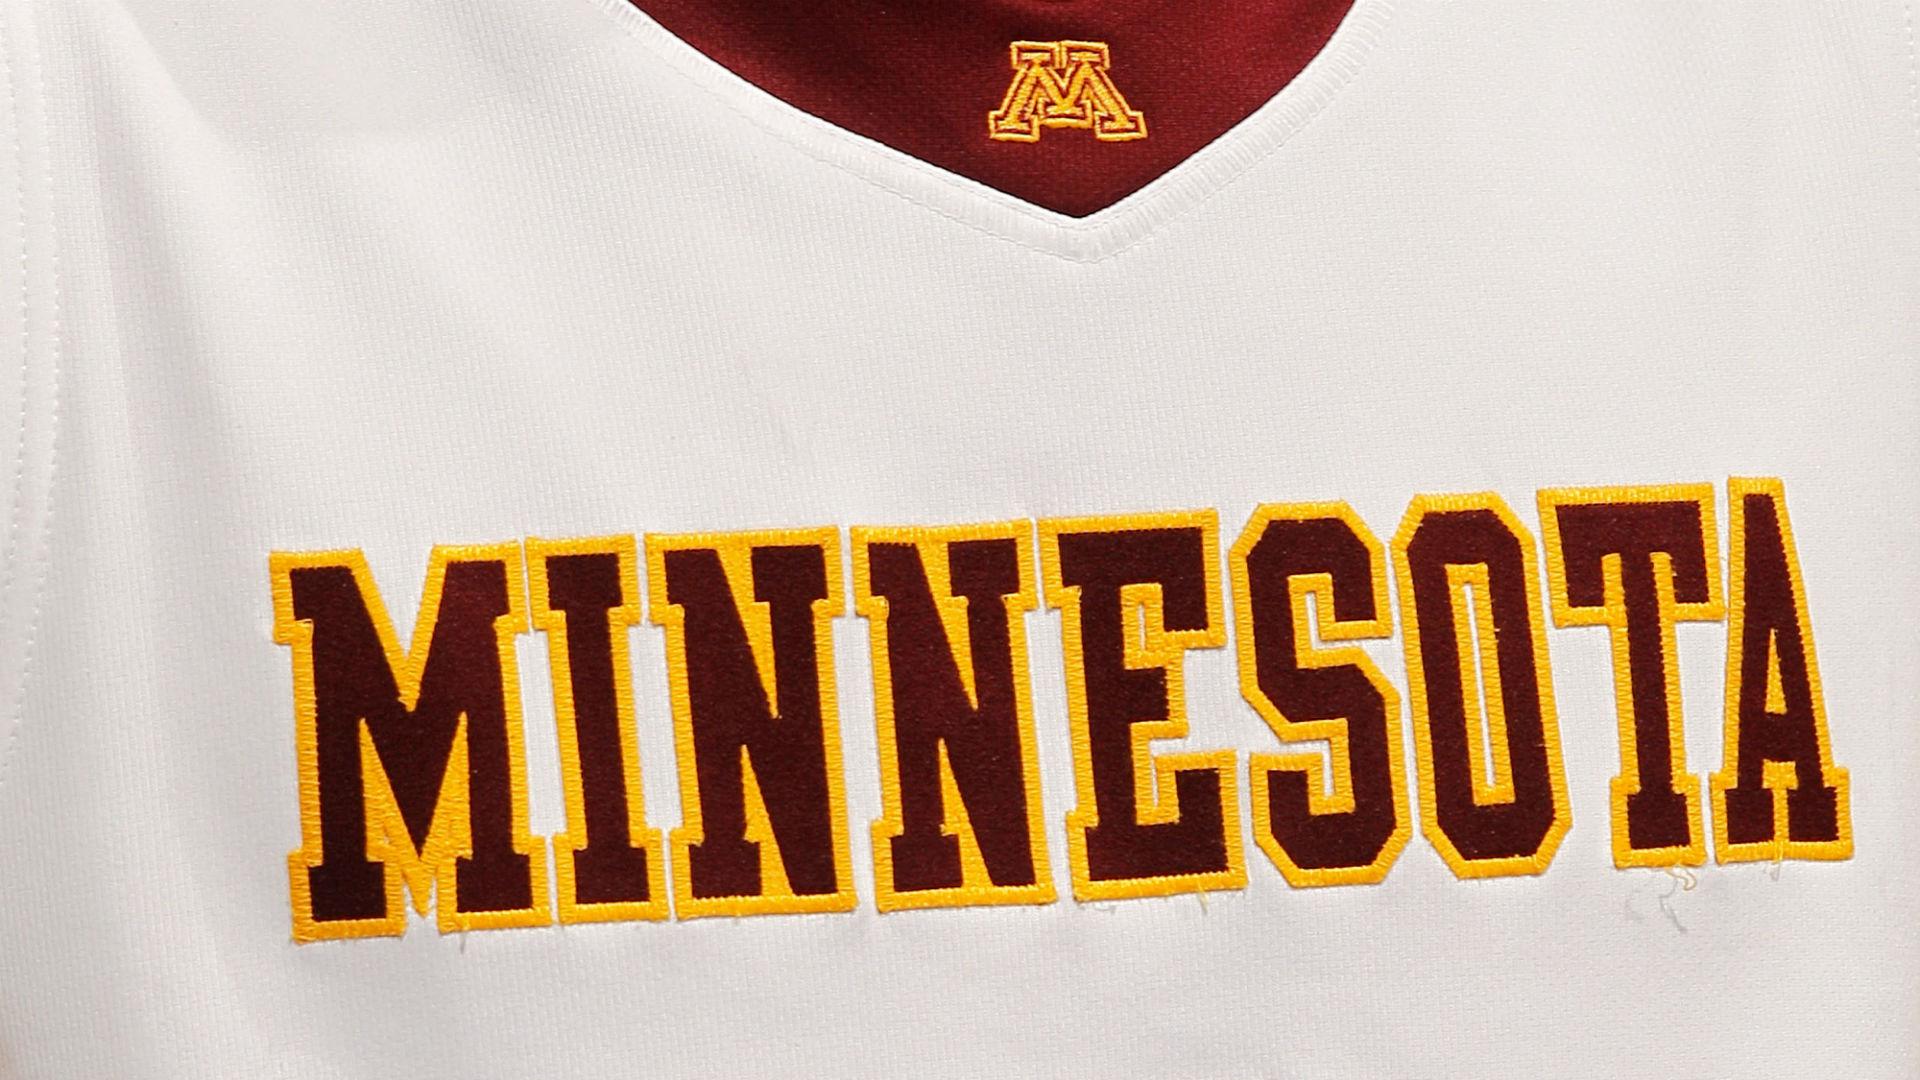 Minnesota-logo_pu1wmhfmm20p1f7mdxukonted